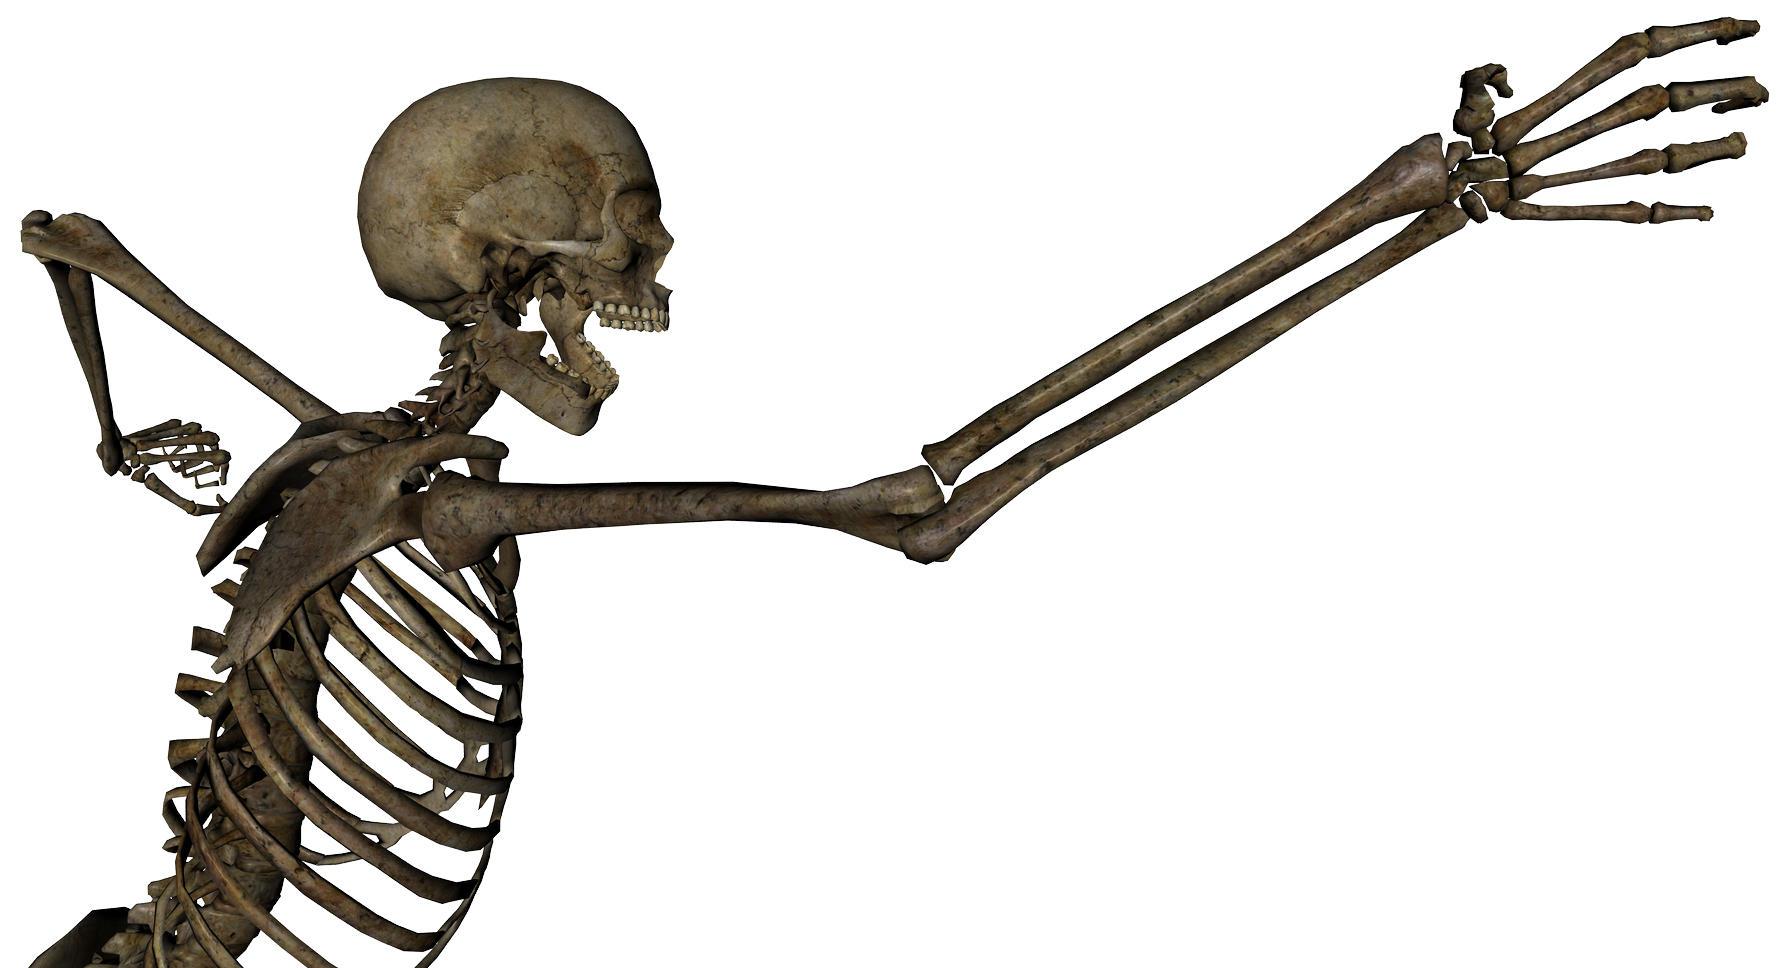 Skeleton - Grasping 1 by markopolio-stock